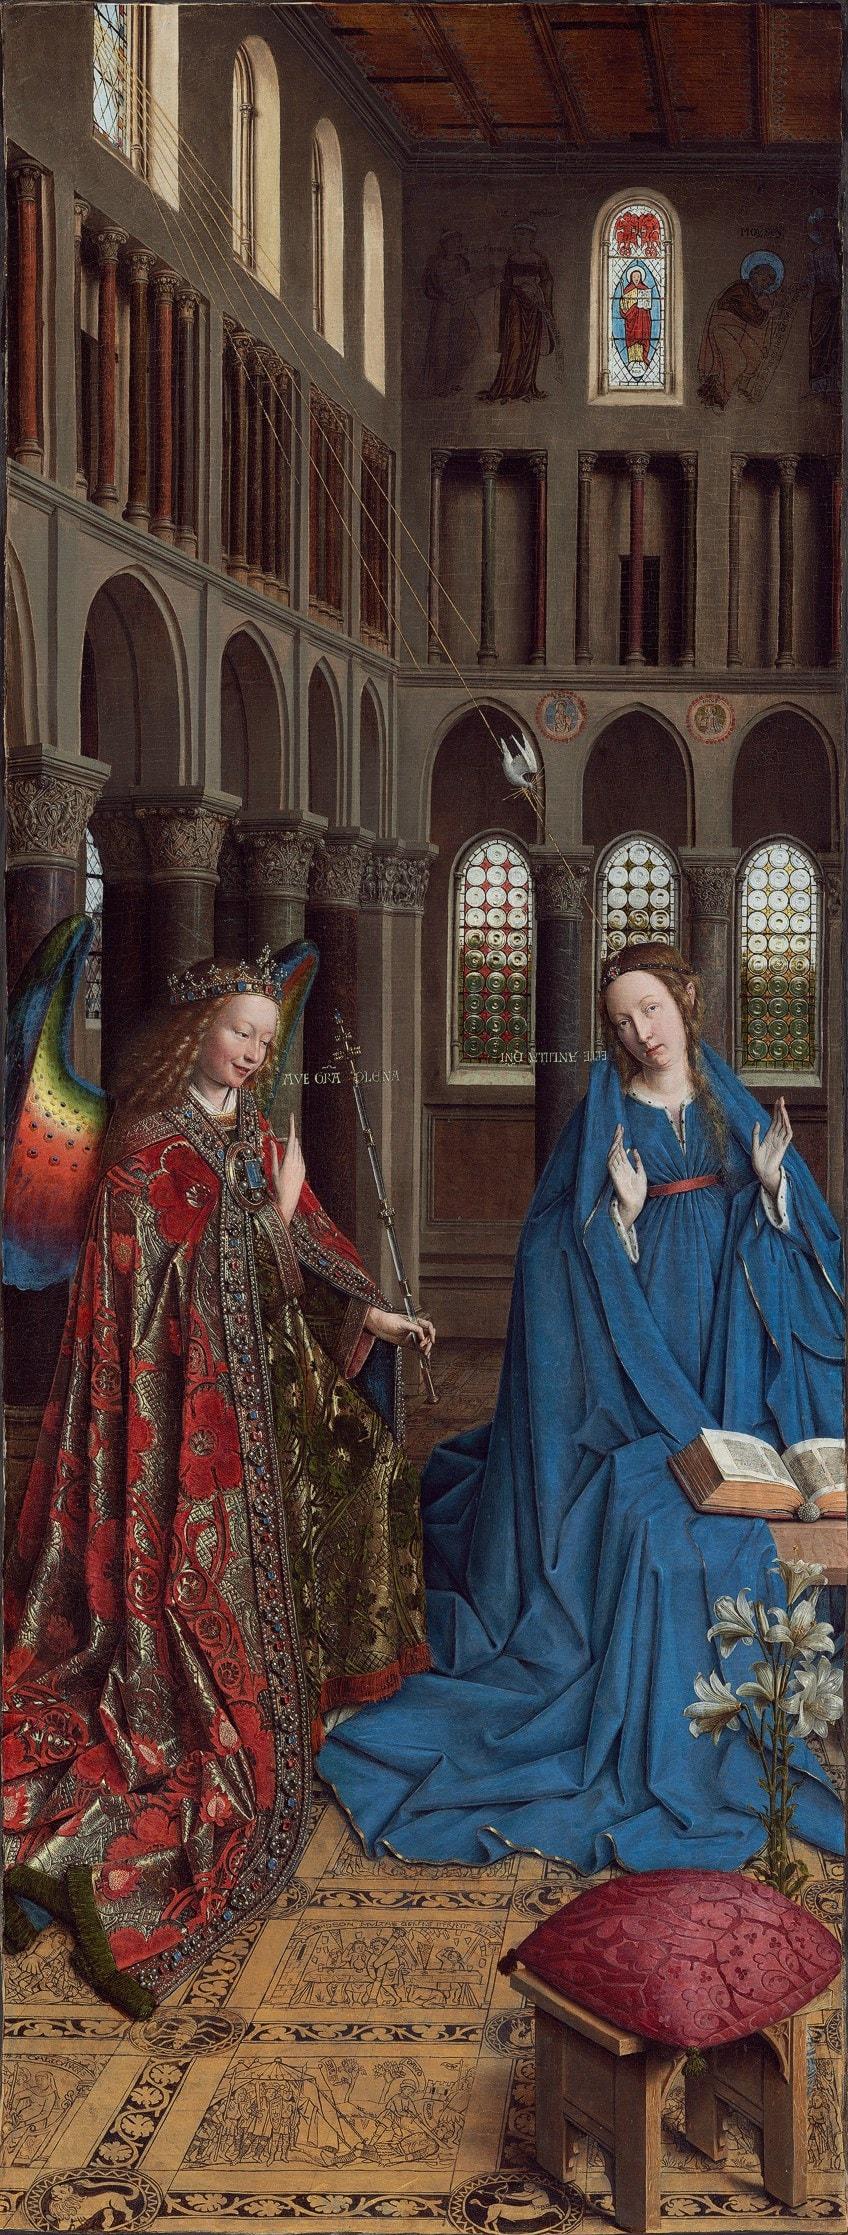 Famous Jan van Eyck Portrait Paintings